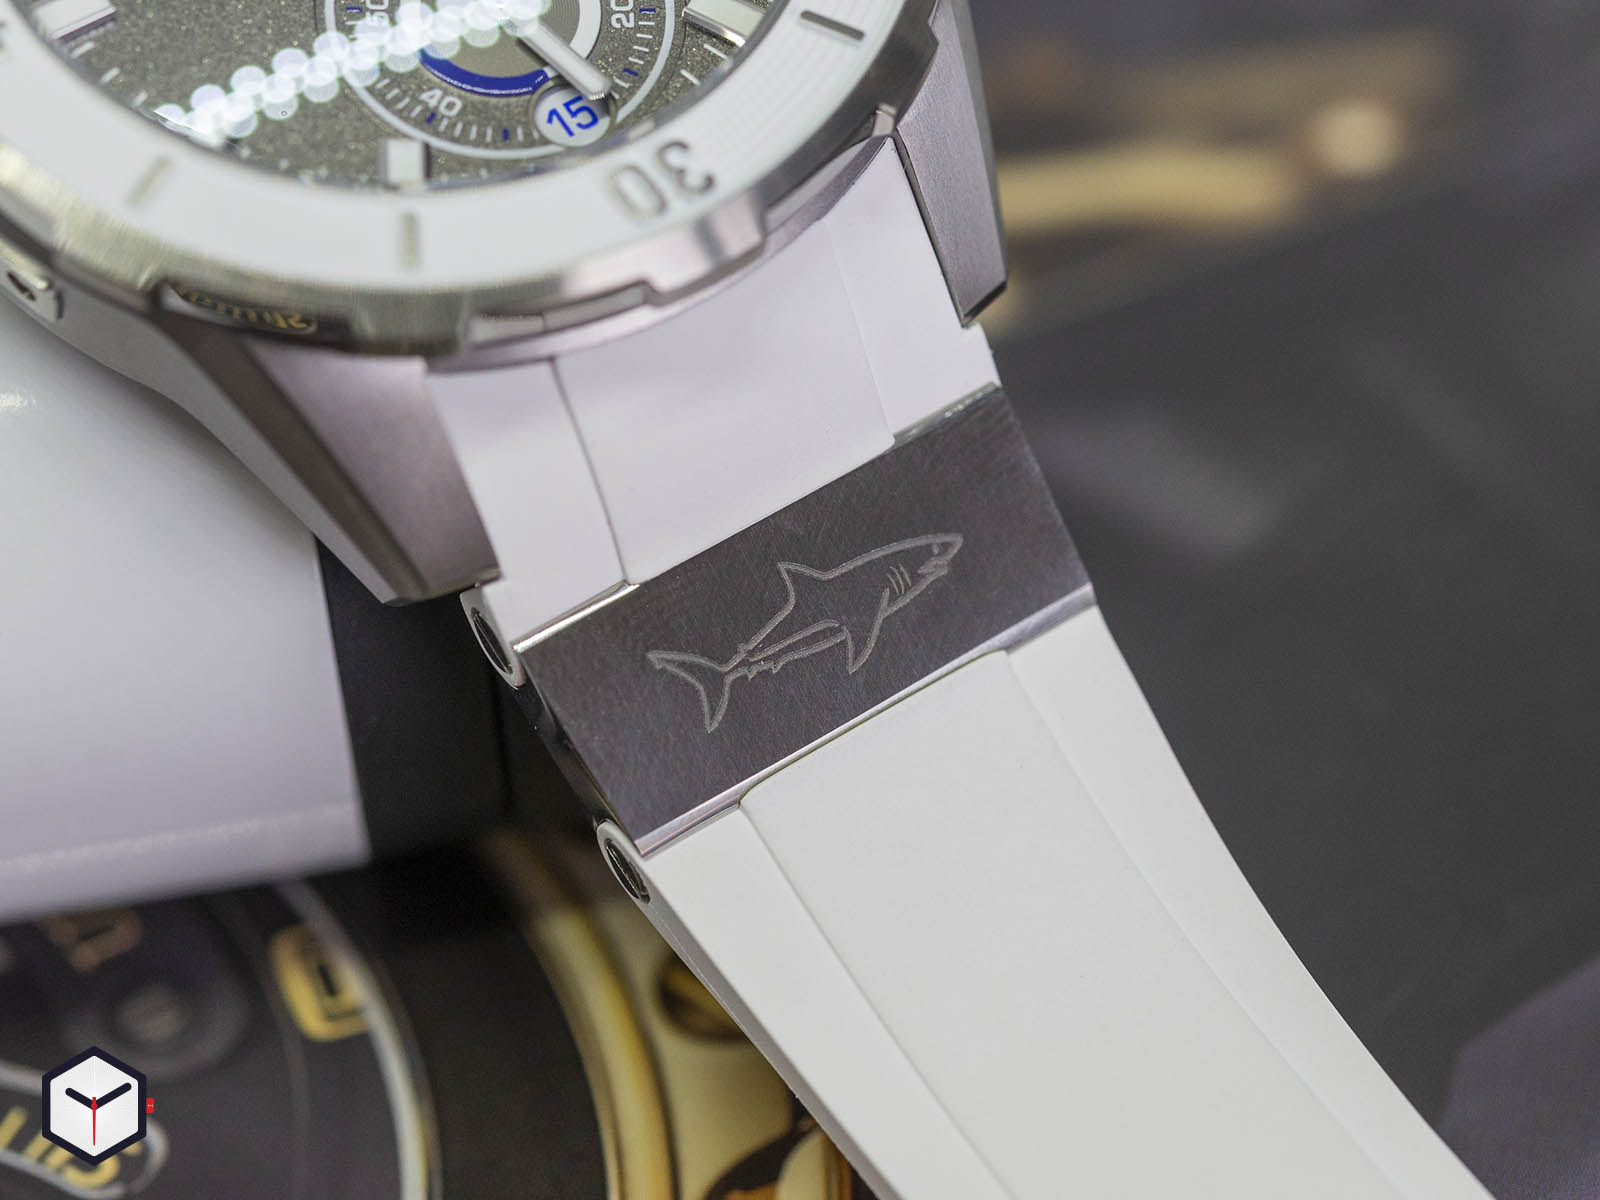 1183-170le-3-90-gw-ulysse-nardin-diver-chronometer-4.jpg